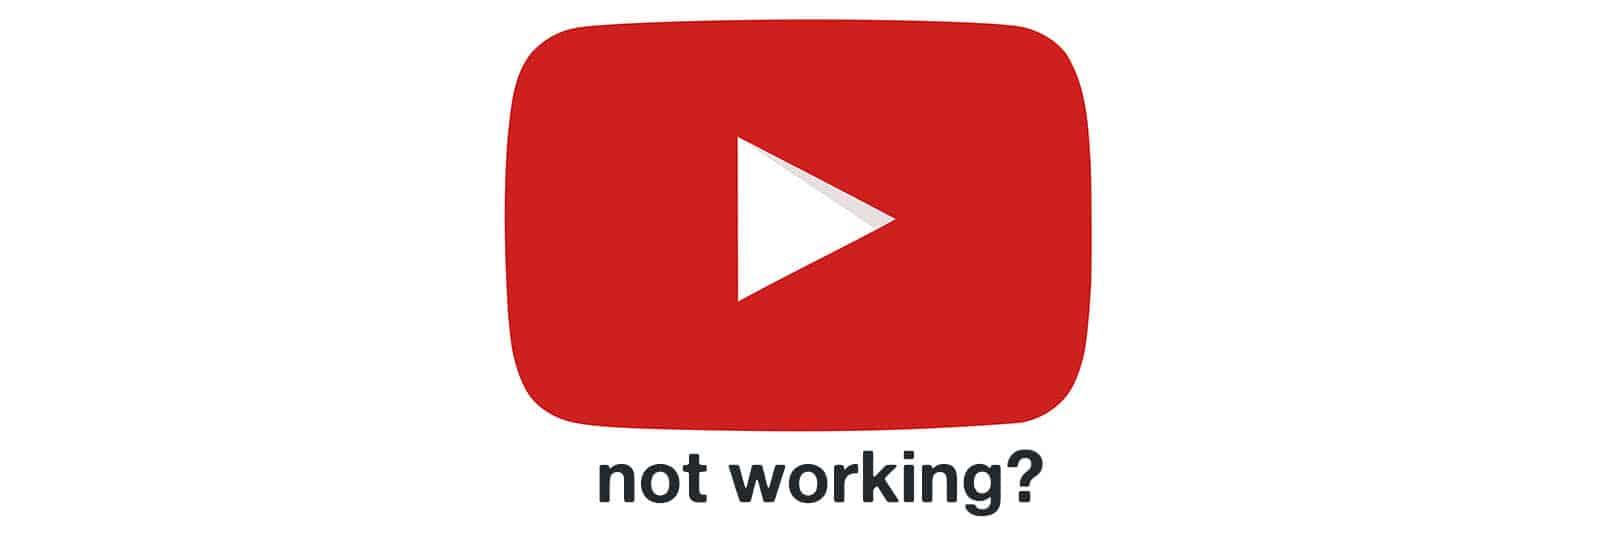 youtube-app-not-working